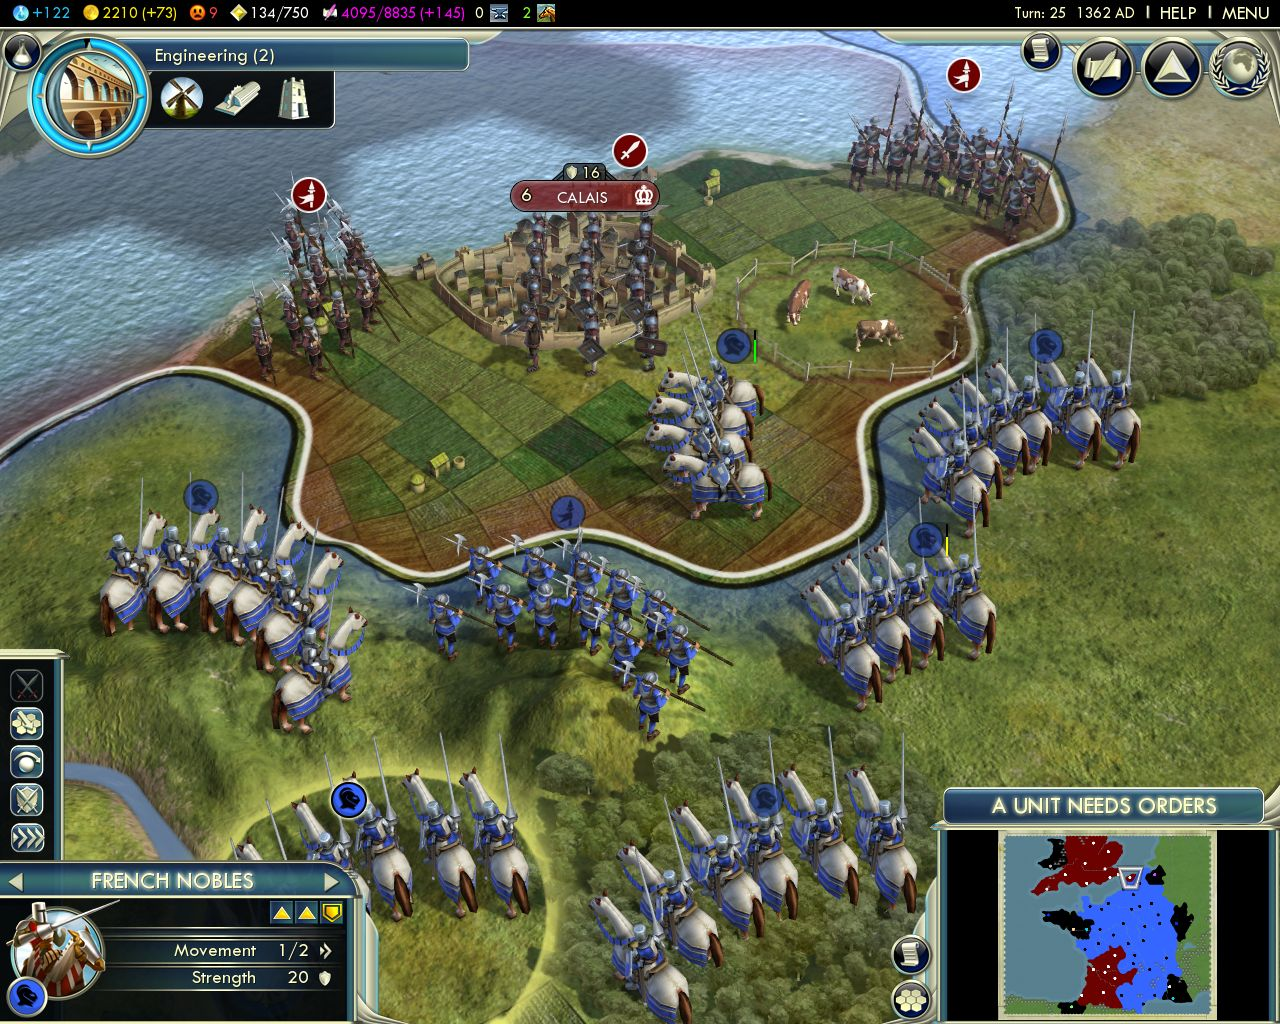 French Knightsing Calais Image